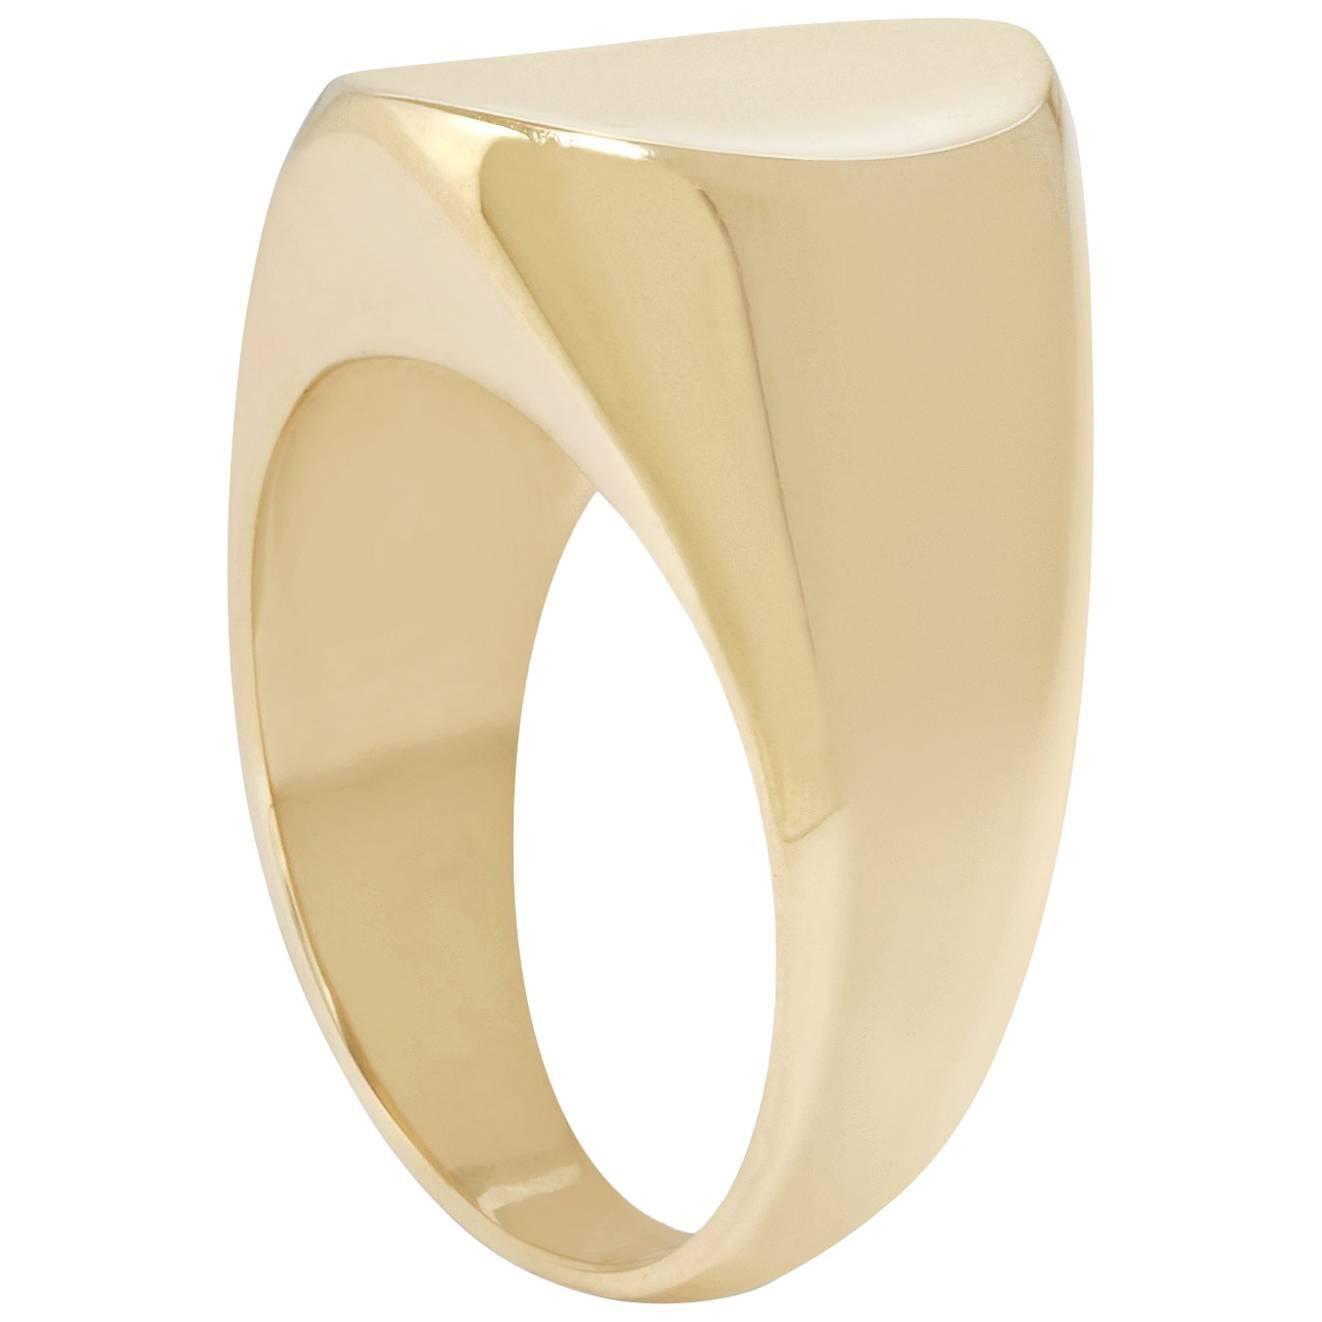 Concave Signet Ring in 9 Karat Gold by Allison Bryan